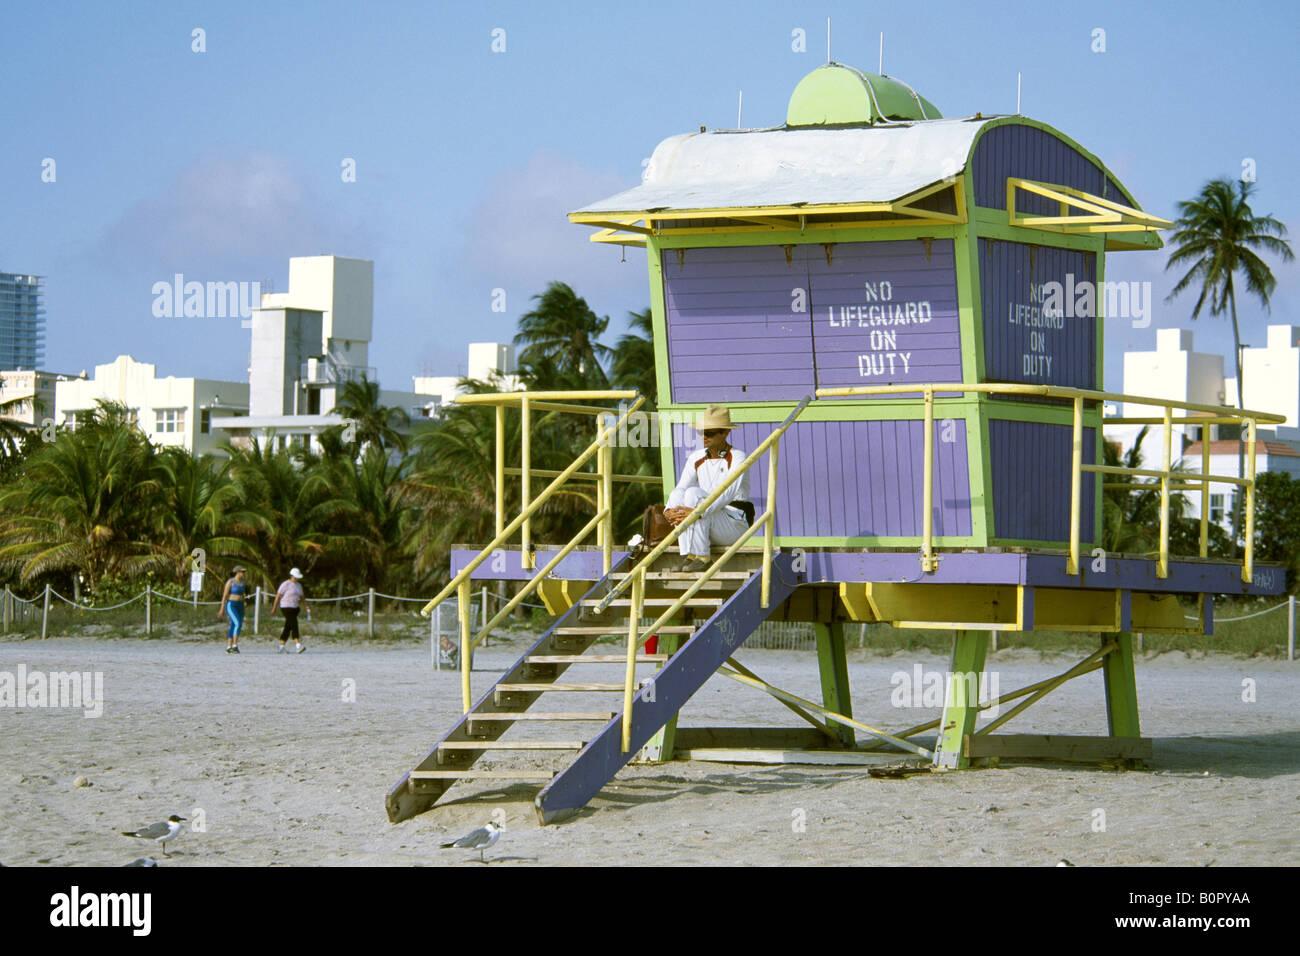 Life Guard South Beach Miami Beach Miami Florida USA Stock Photo